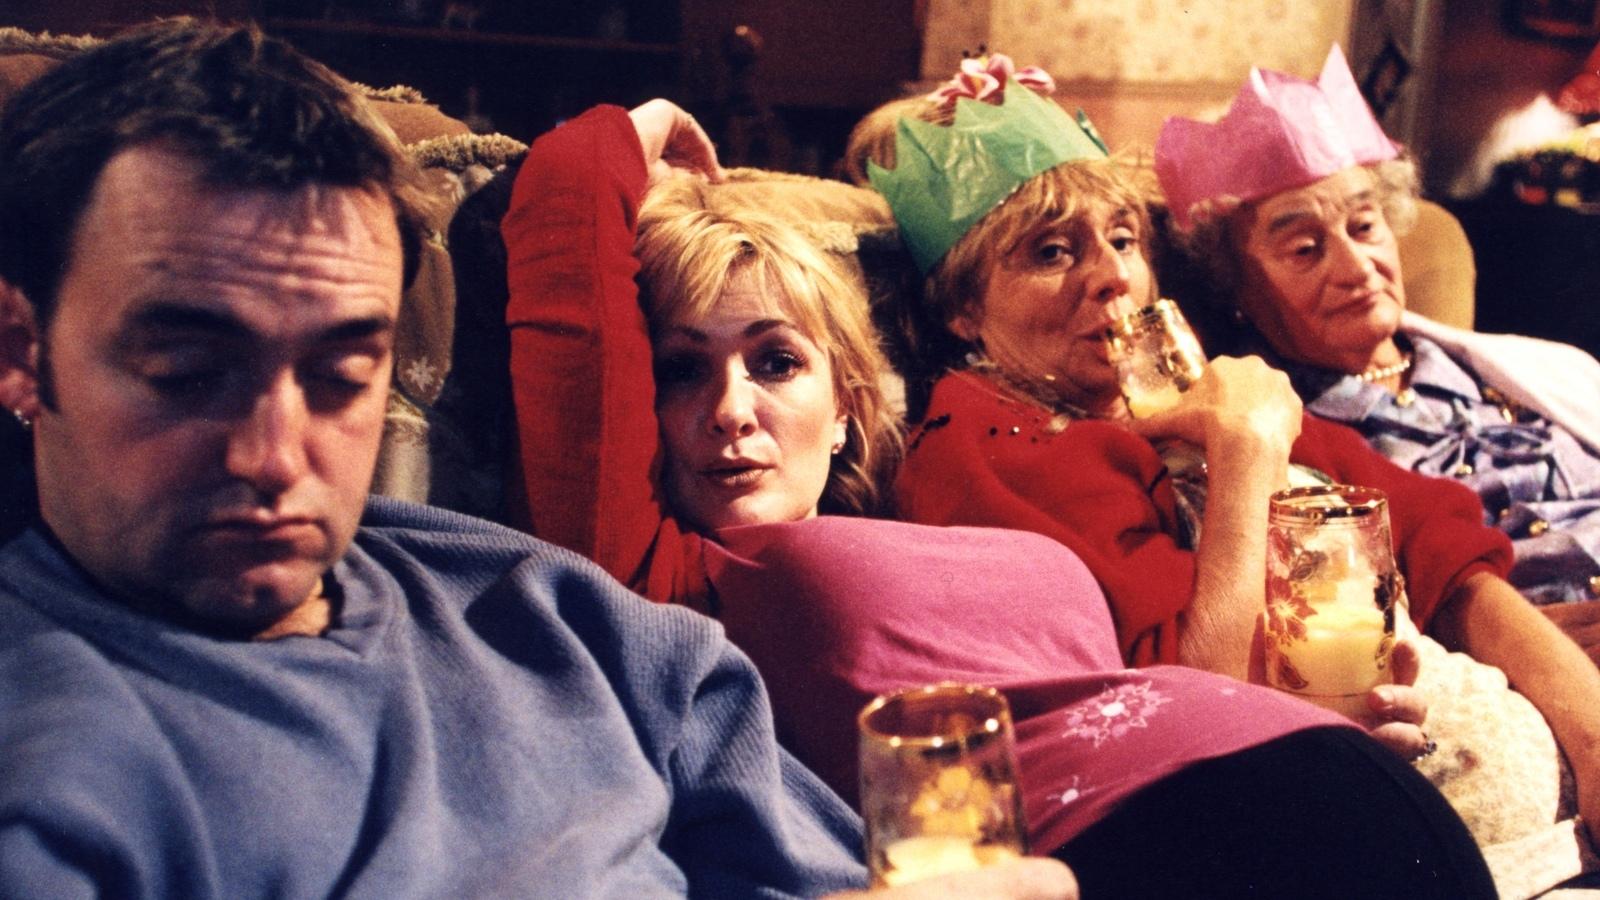 Royle family on sofa at Christmas